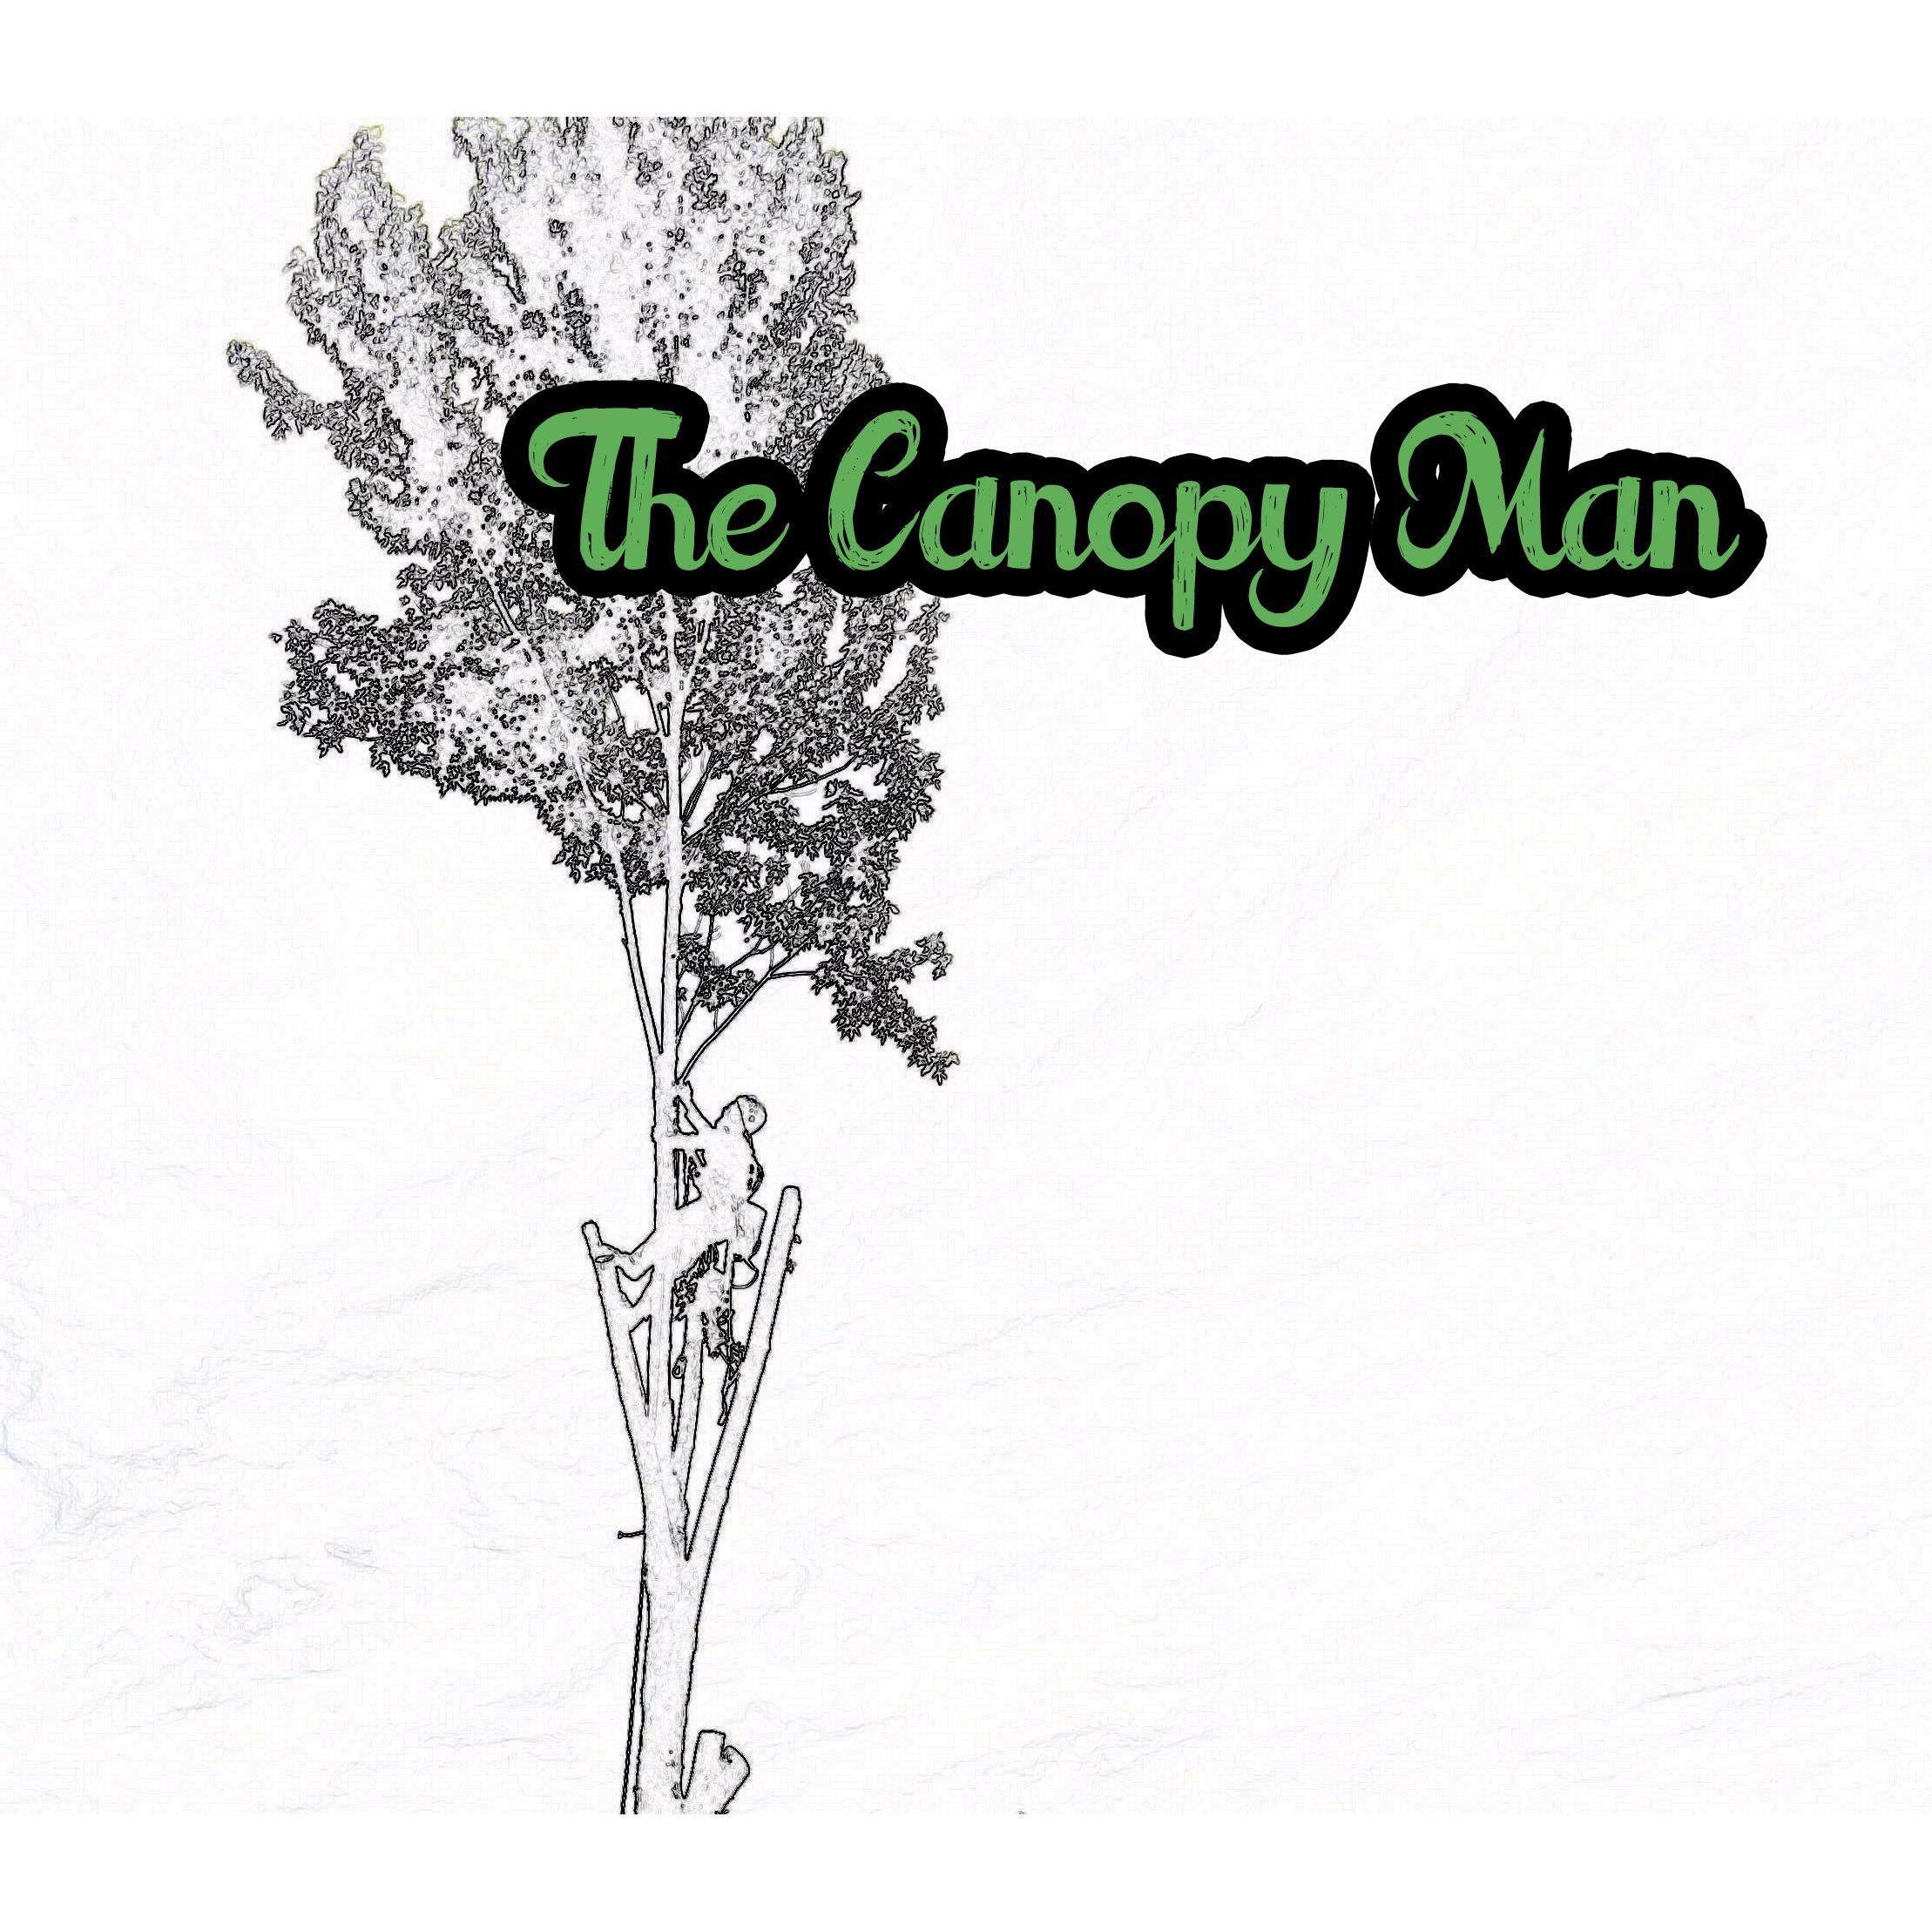 The Canopy Man